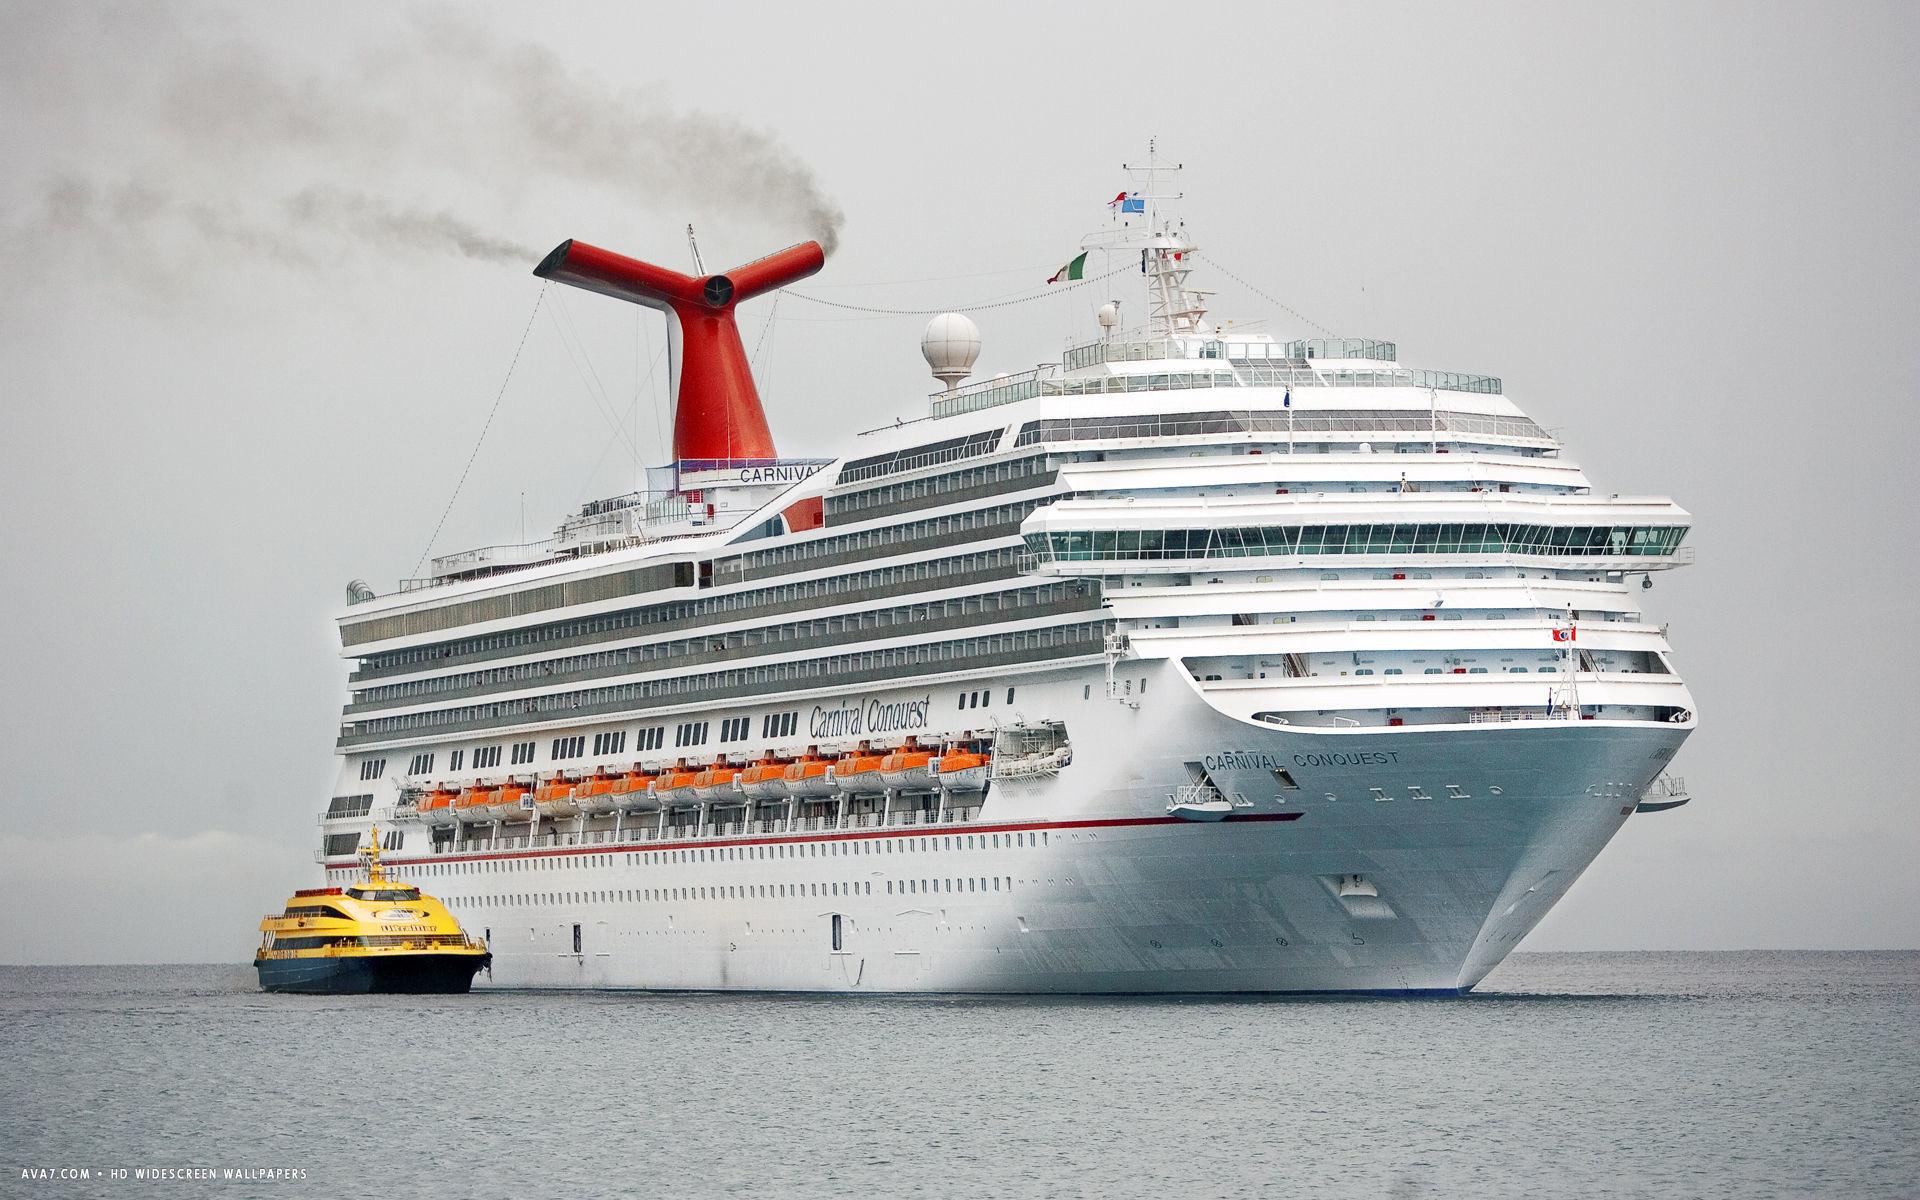 carnival conquest cruise ship hd widescreen wallpaper